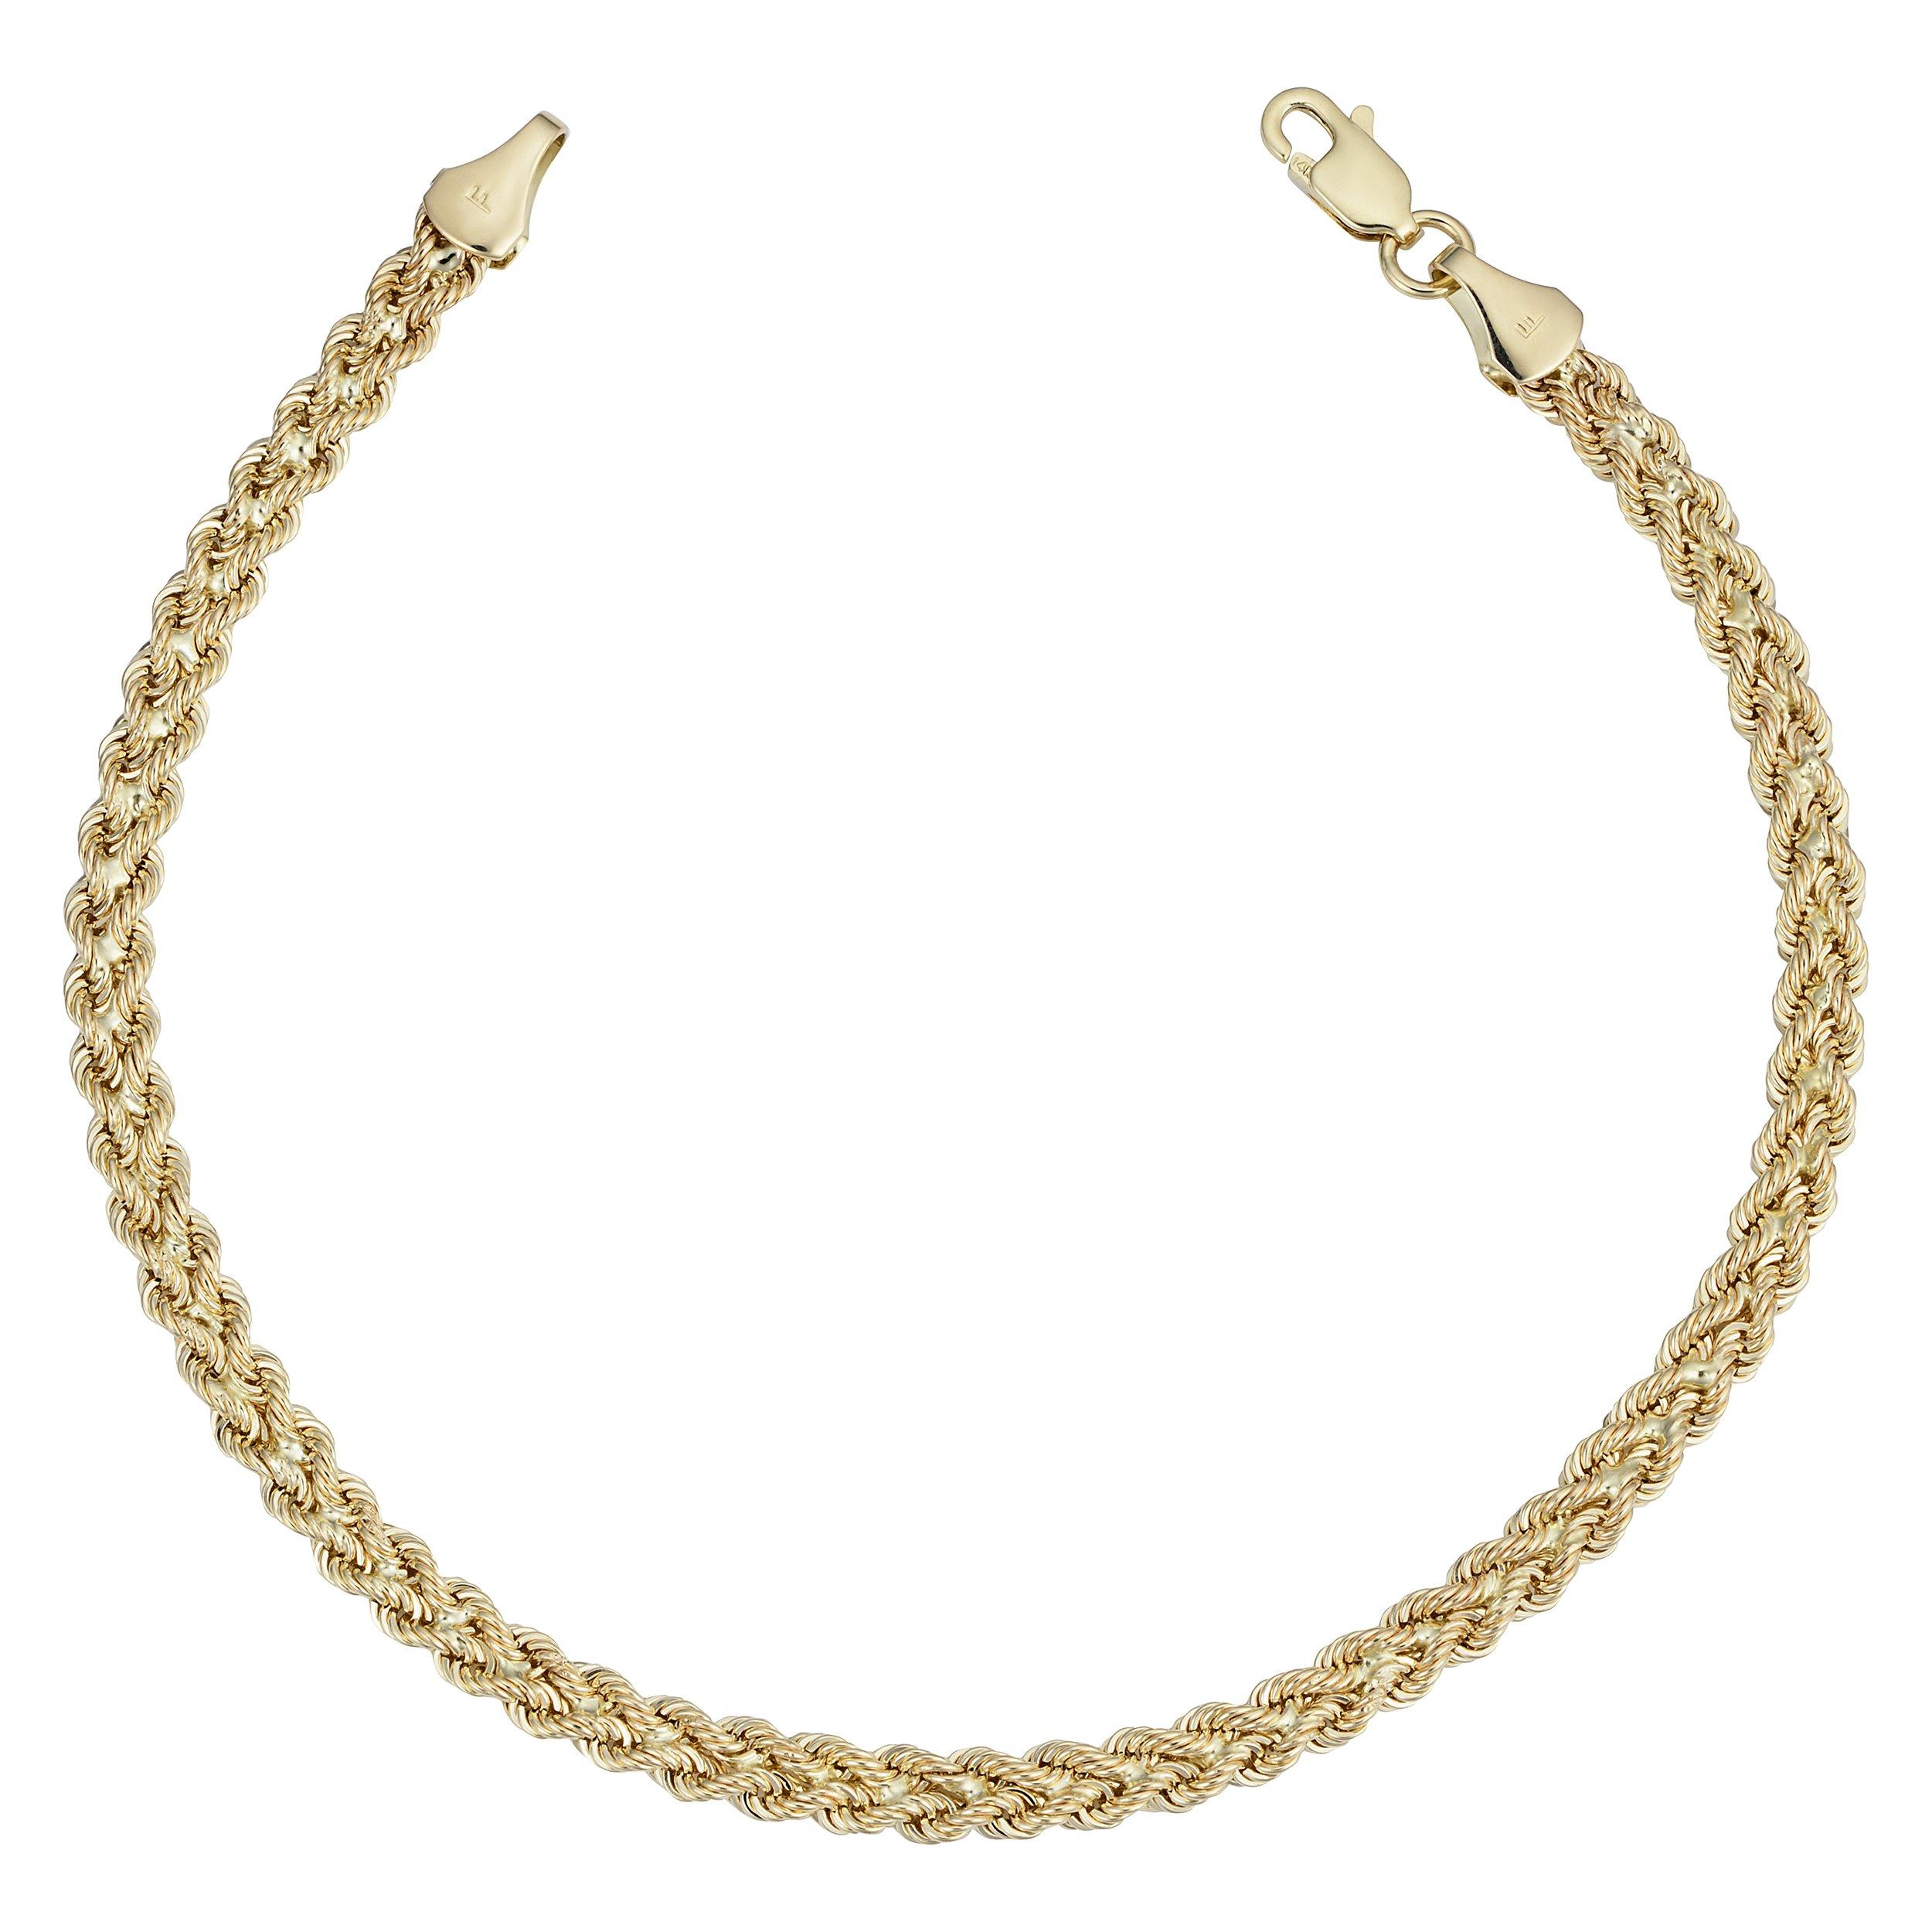 Kooljewelry 14k Yellow Gold Braided Rope Bracelet (3.75 mm, 7.5 inch) by Kooljewelry